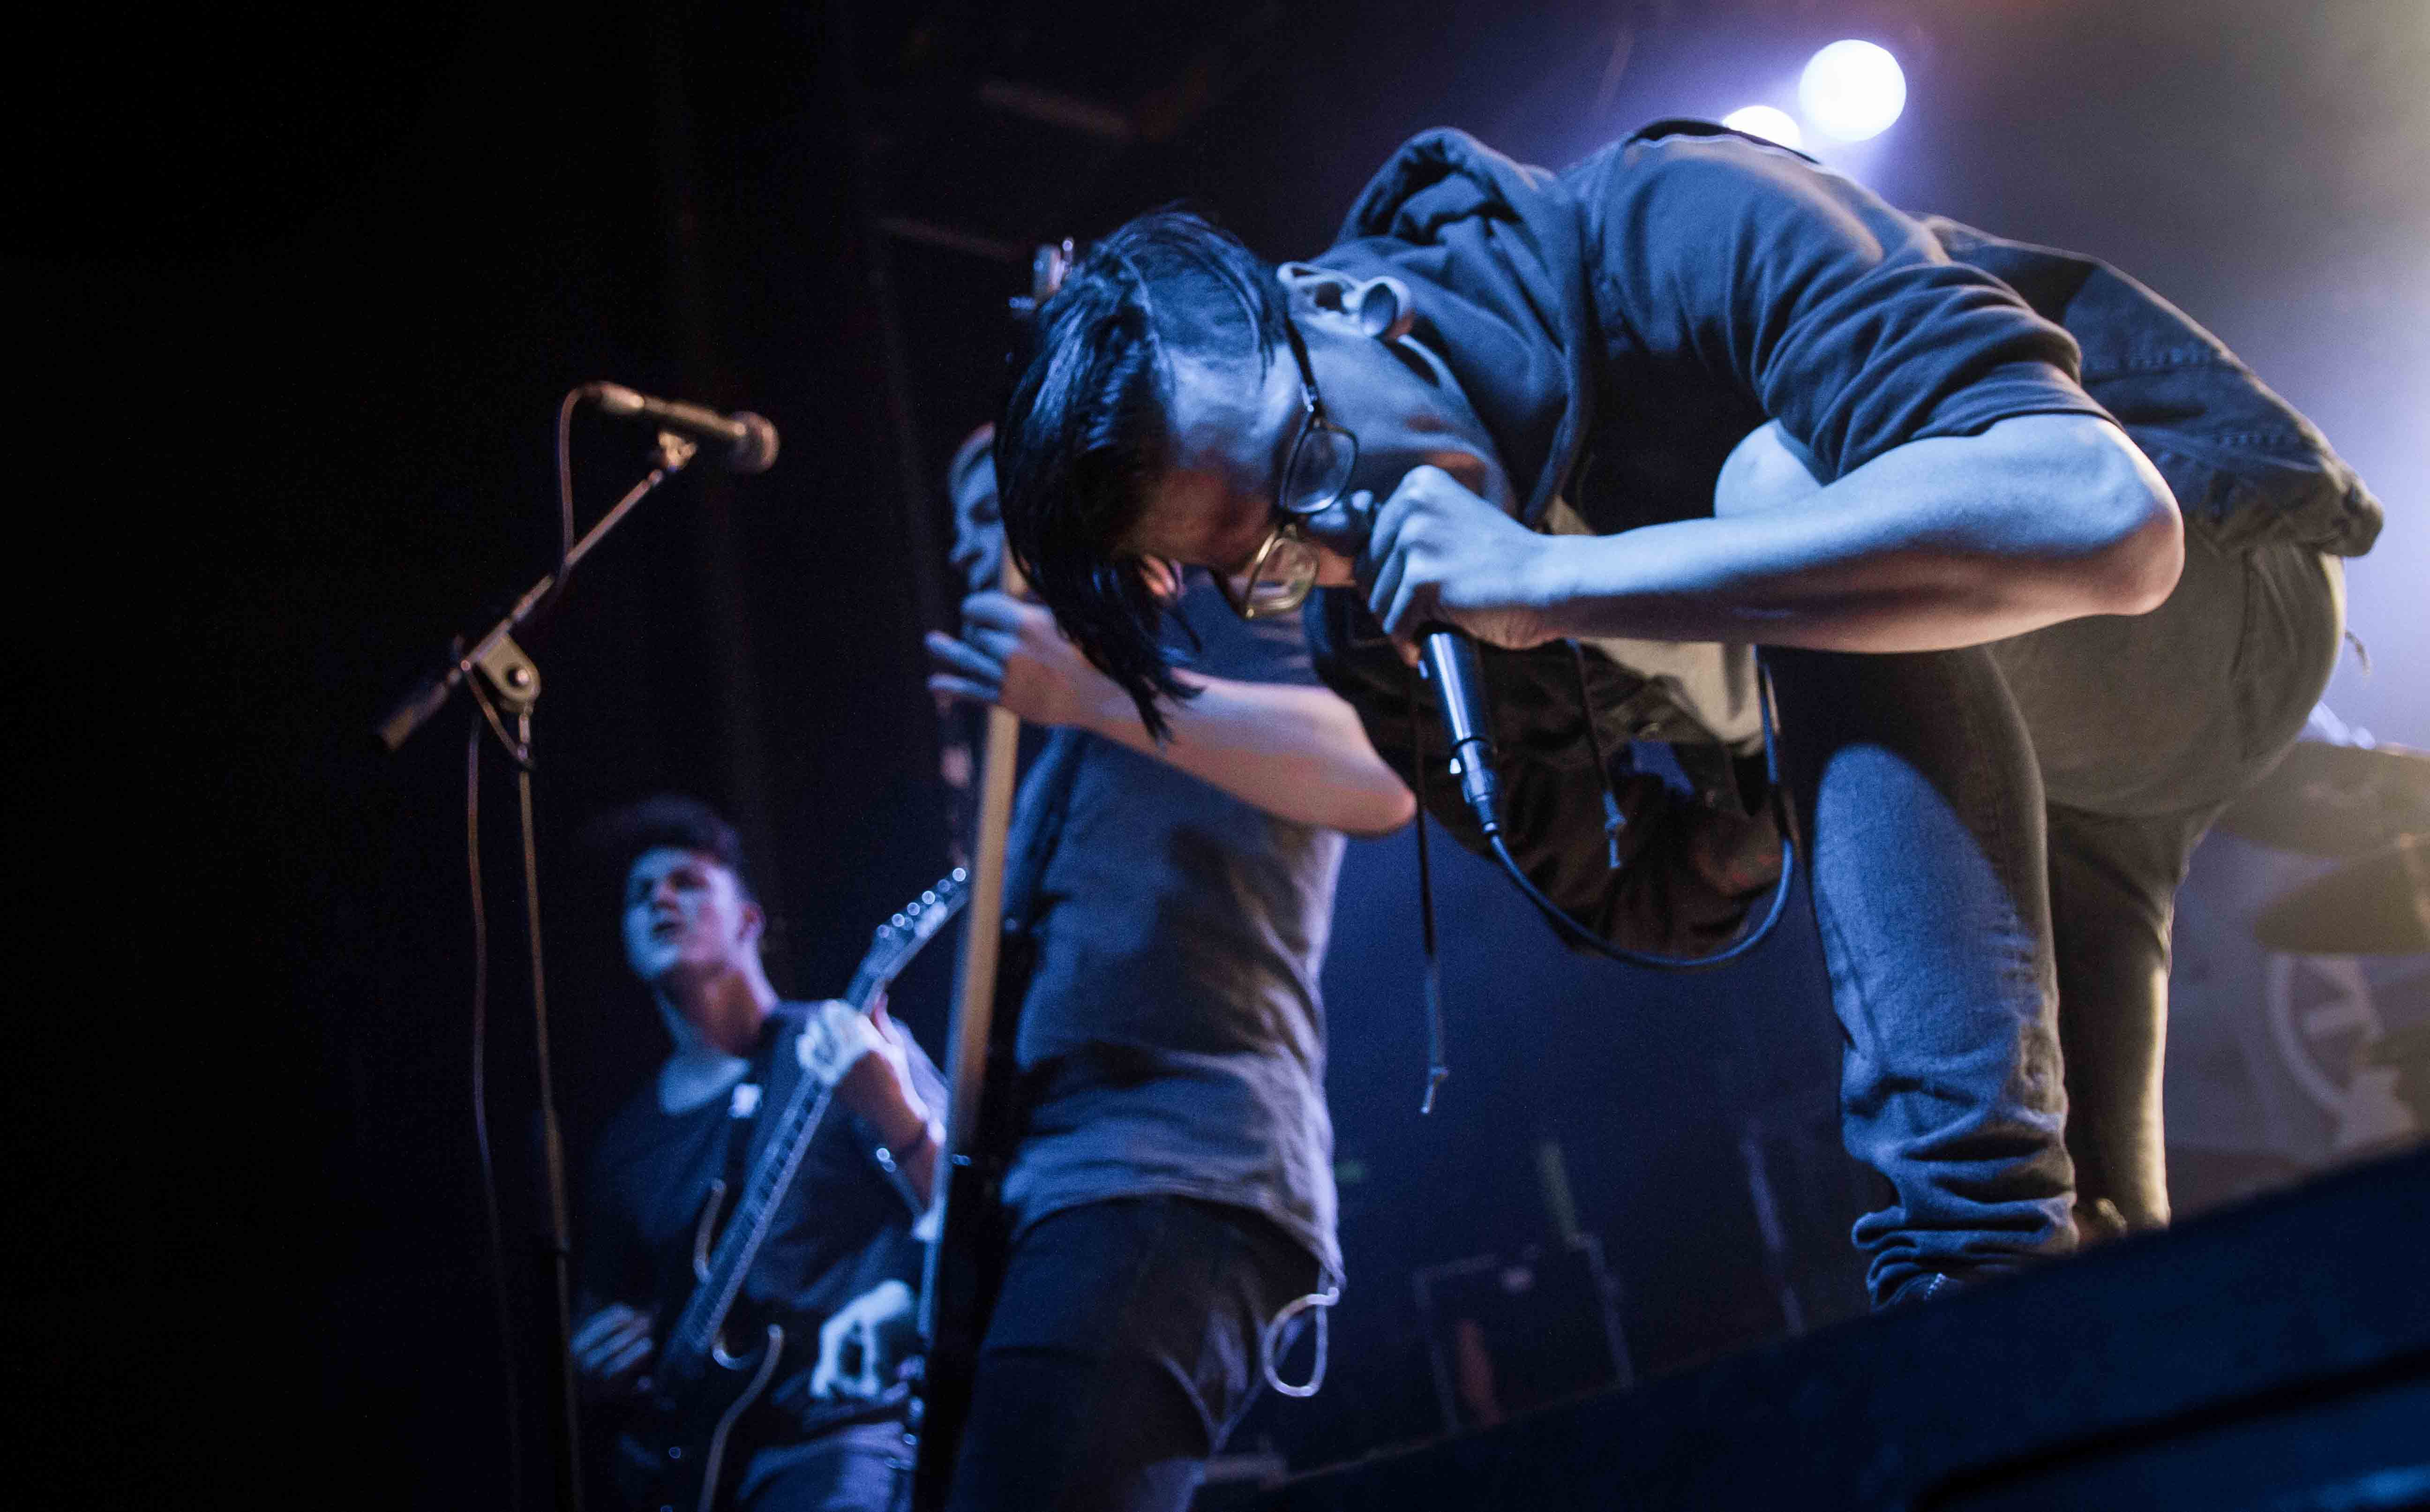 Burning Down Alaska live, 28.04.2015, Berlin